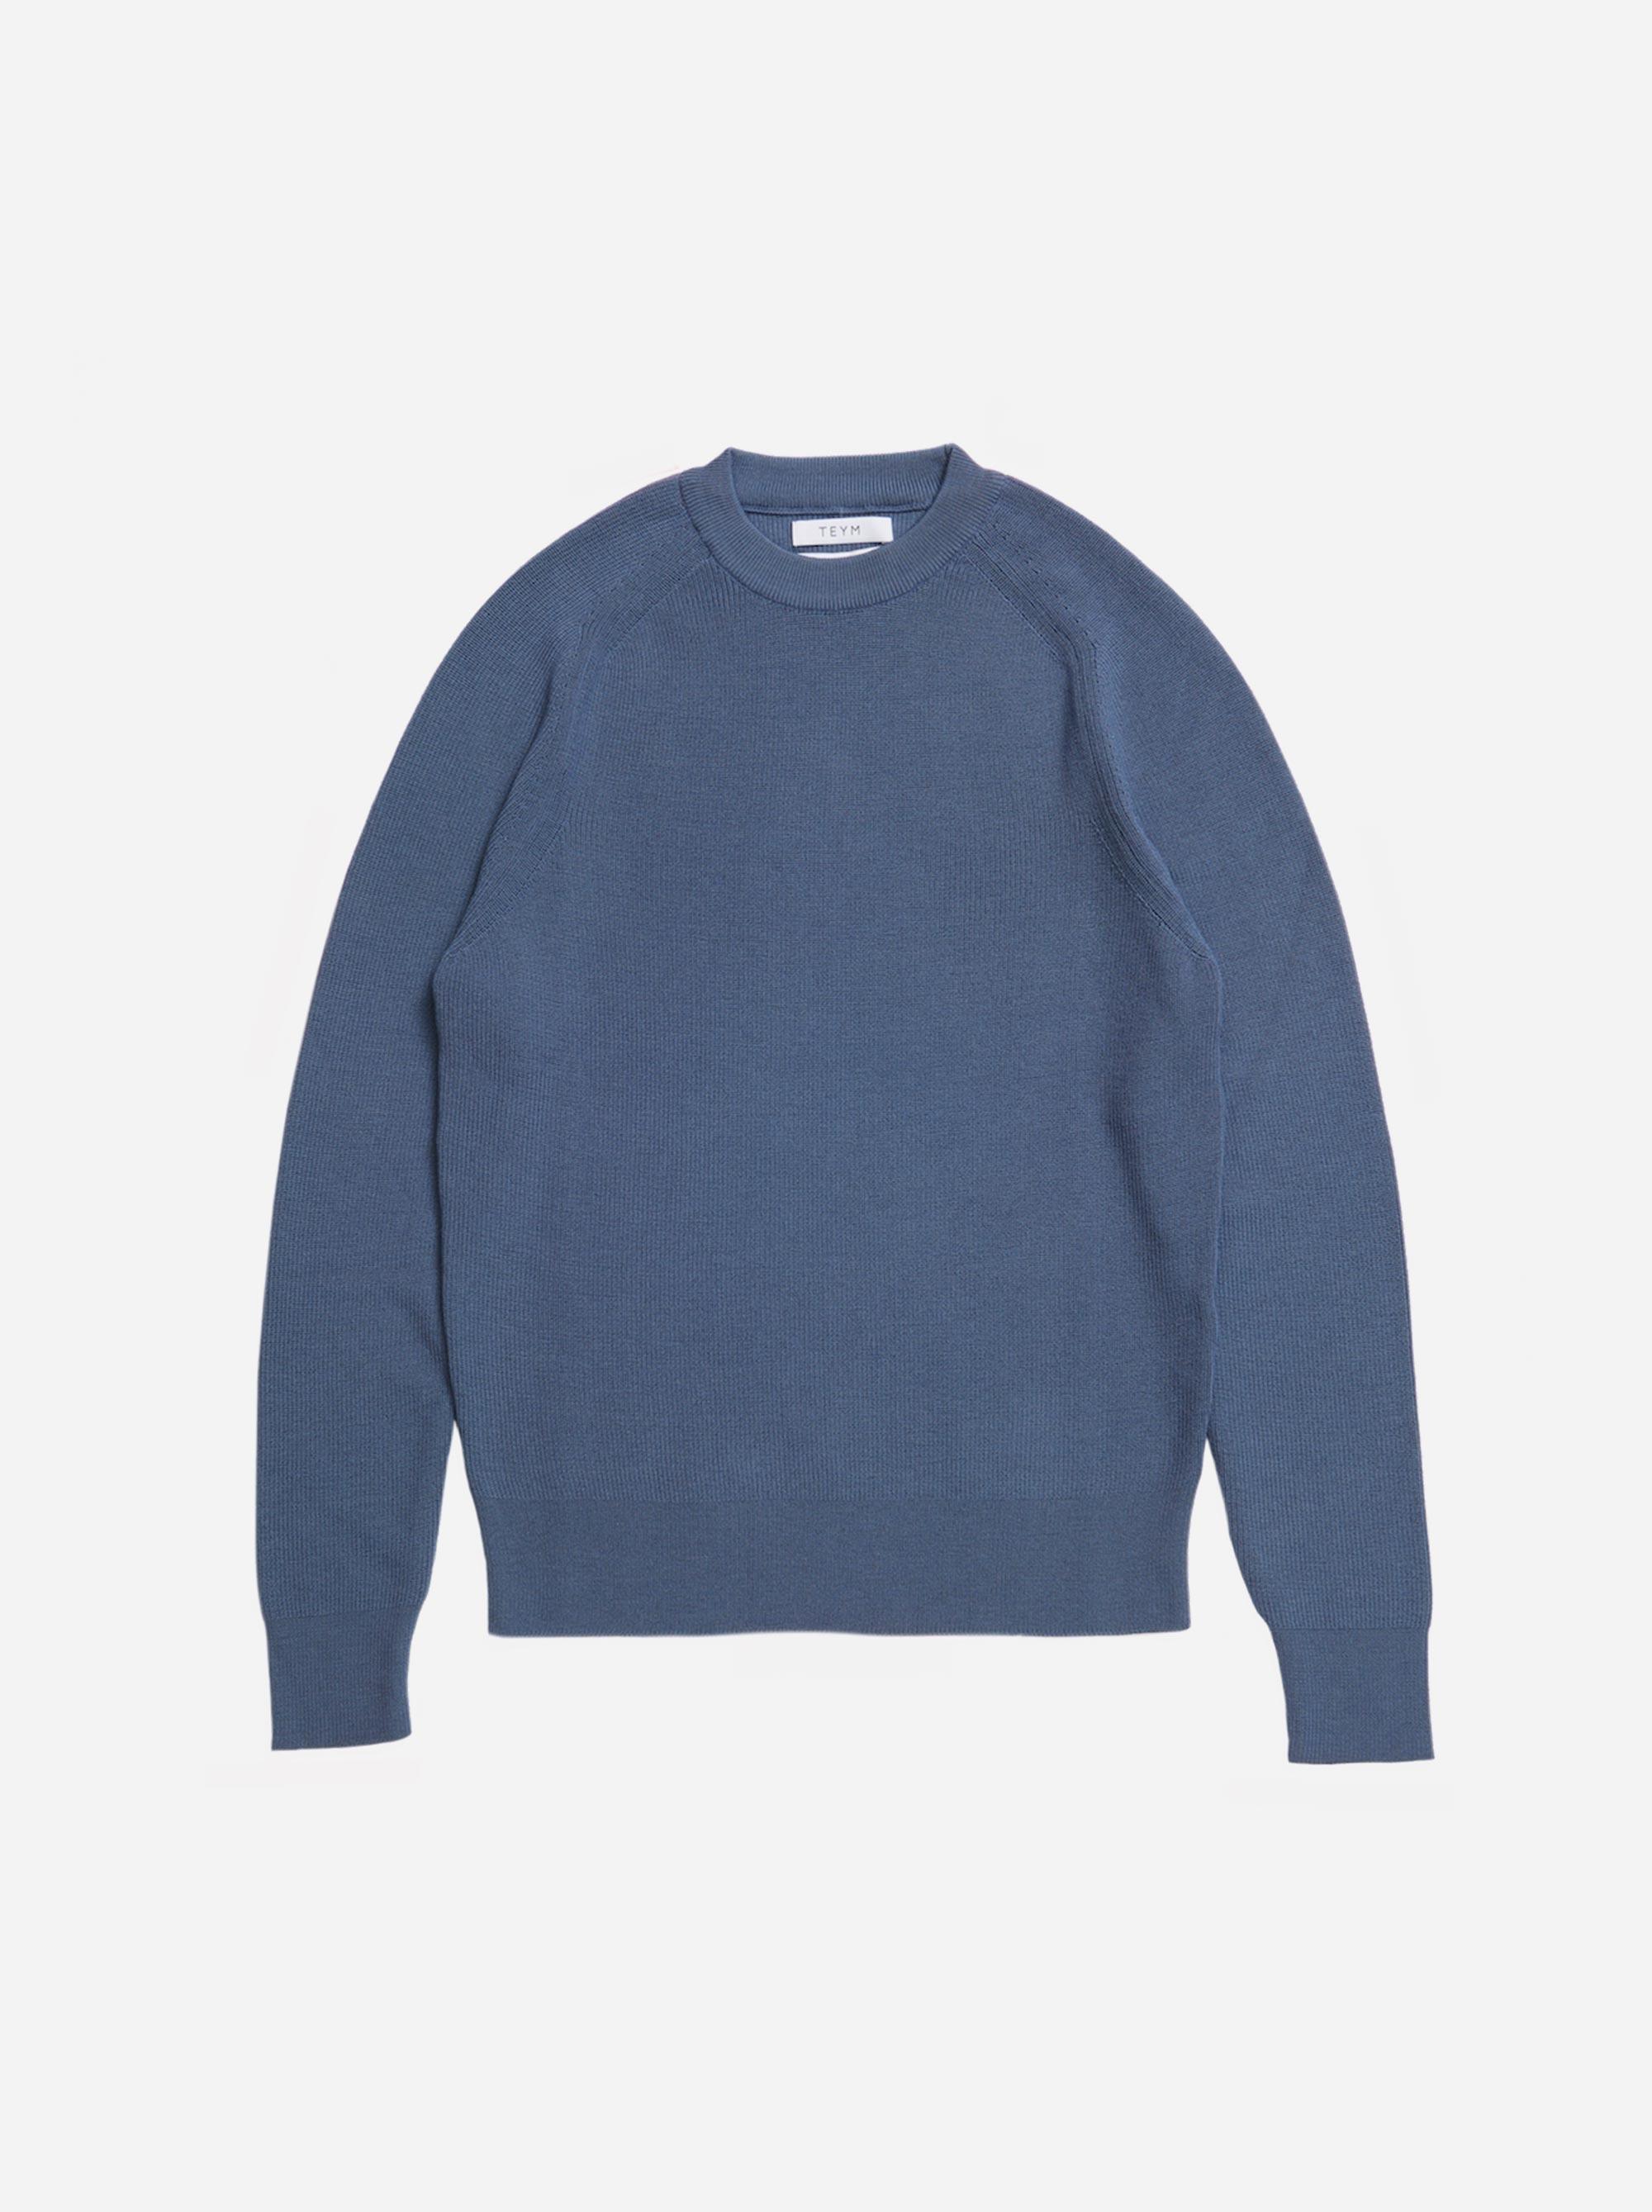 Teym - The Merino Sweater - Men - Sky blue - 4